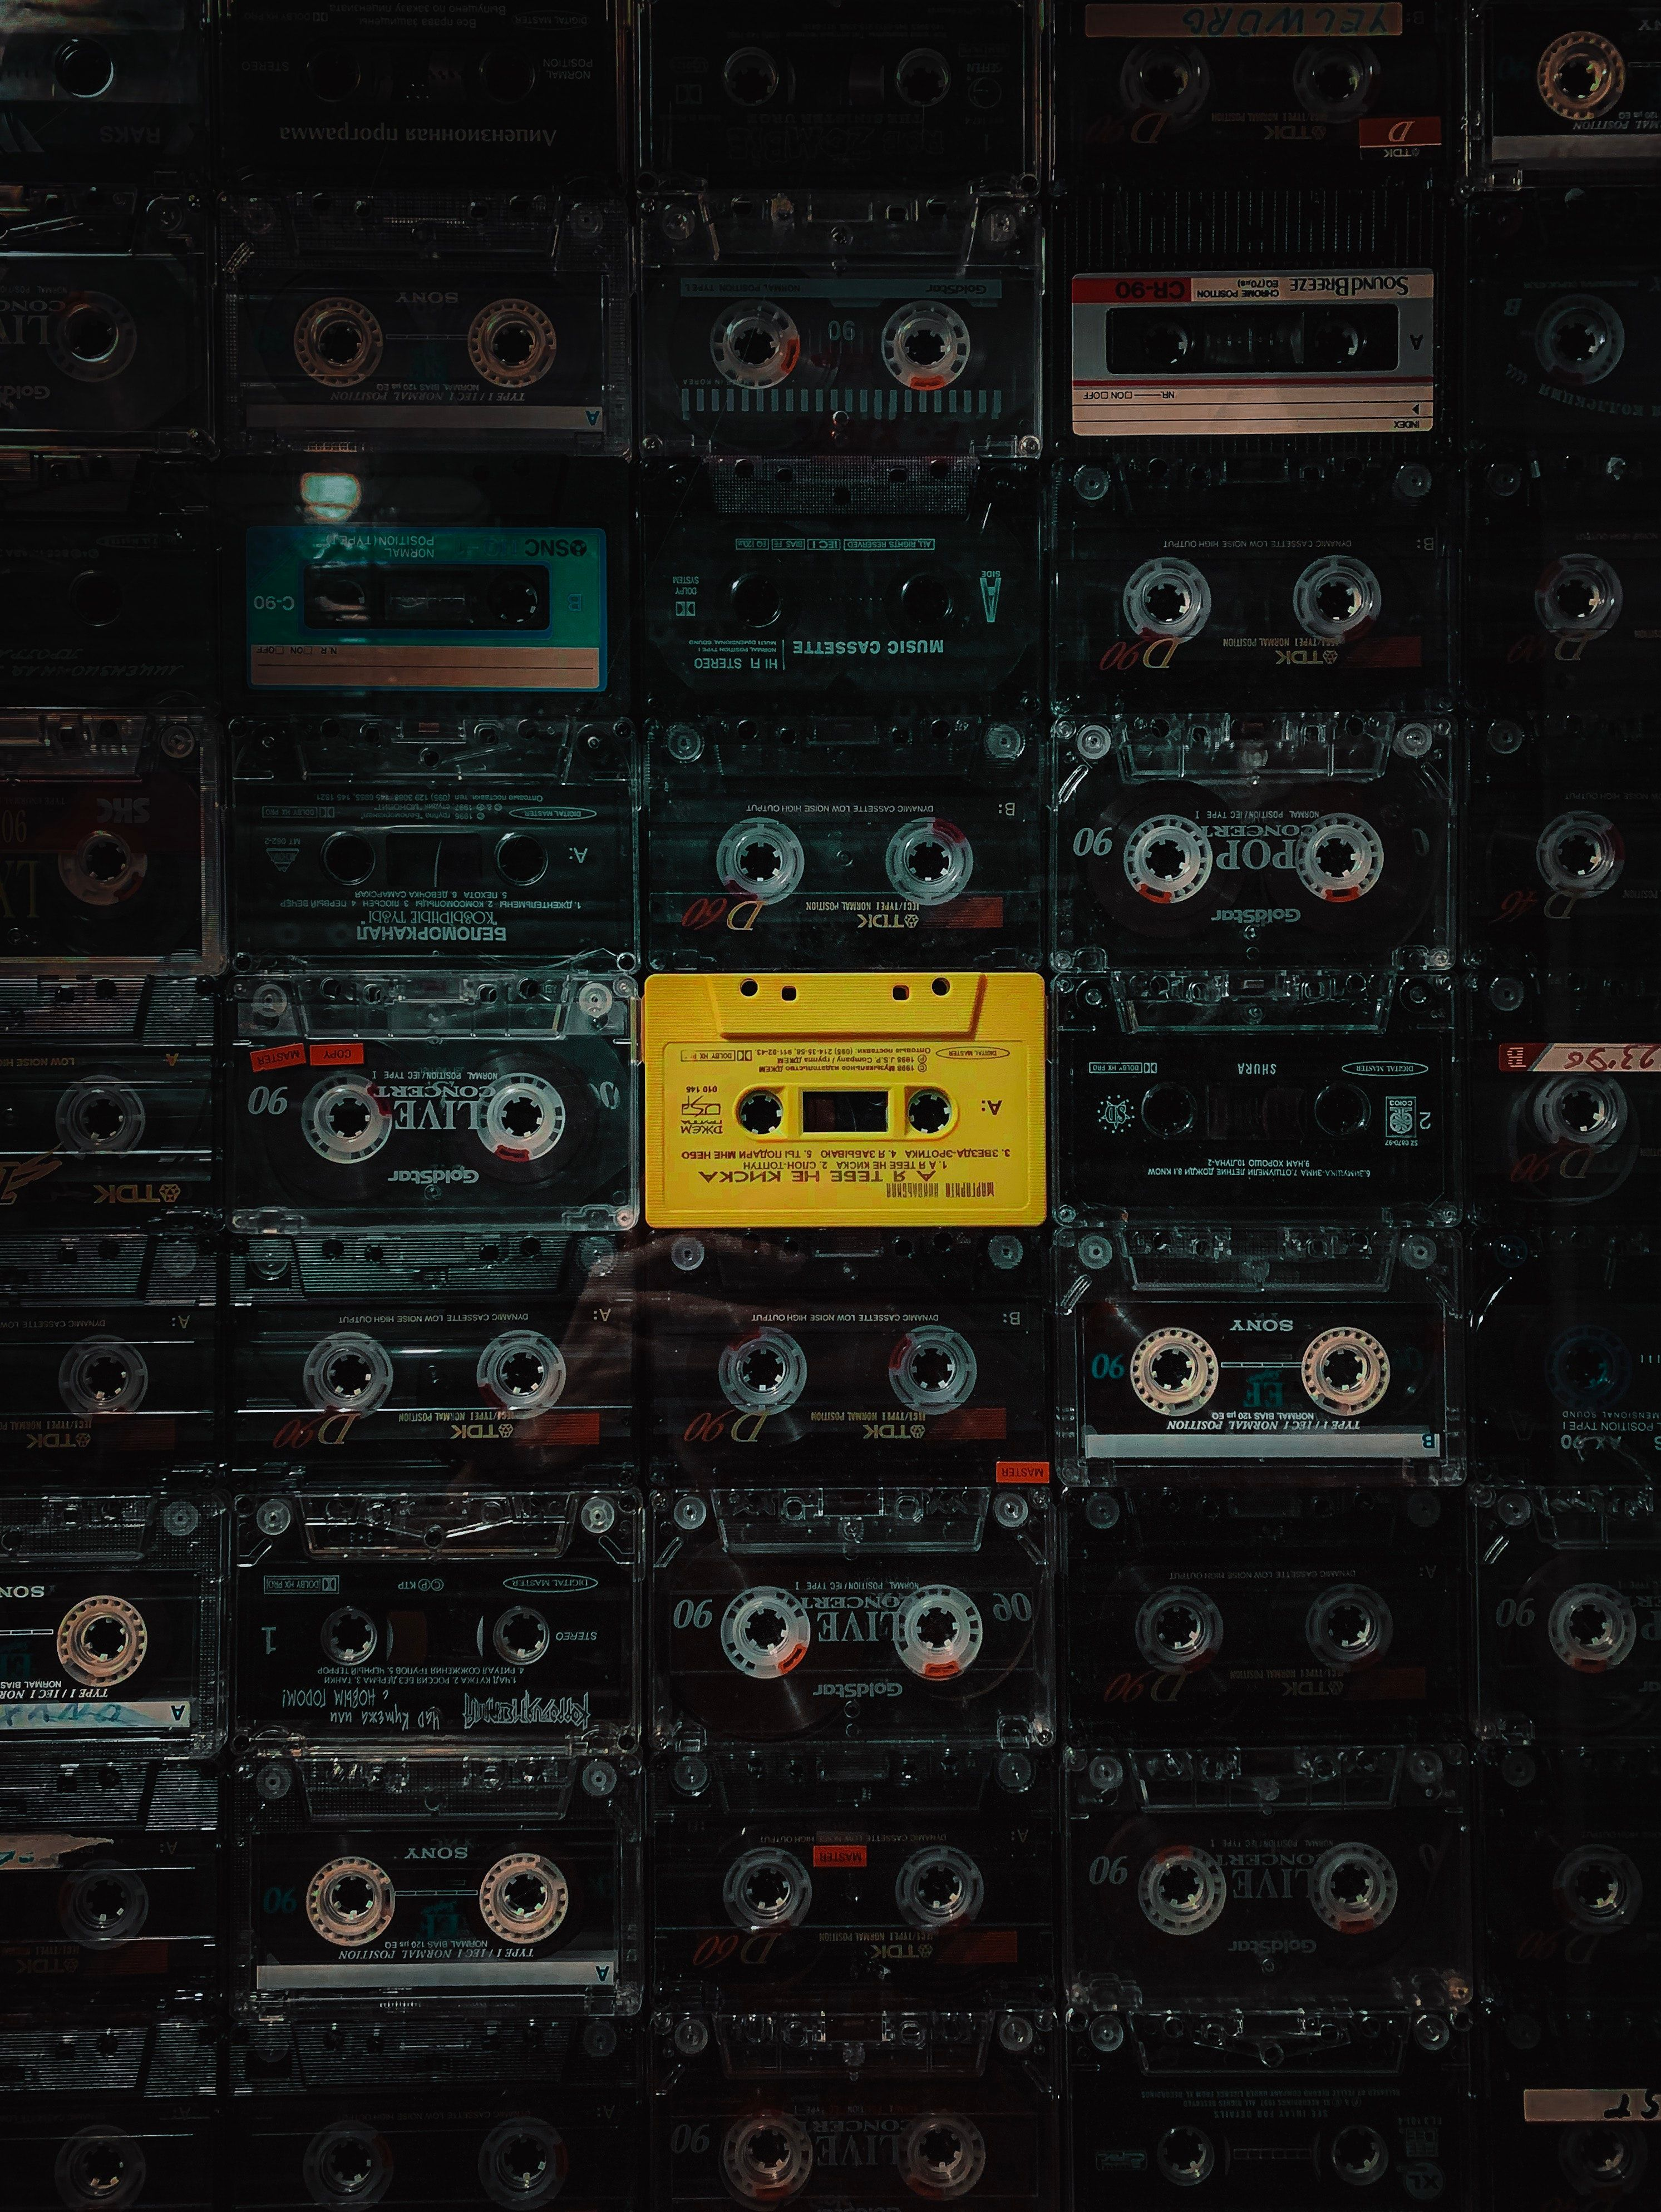 L Alternative Open Source De Fl Studio Tedidev Fond D Ecran Telephone Idees De Selfie Musique